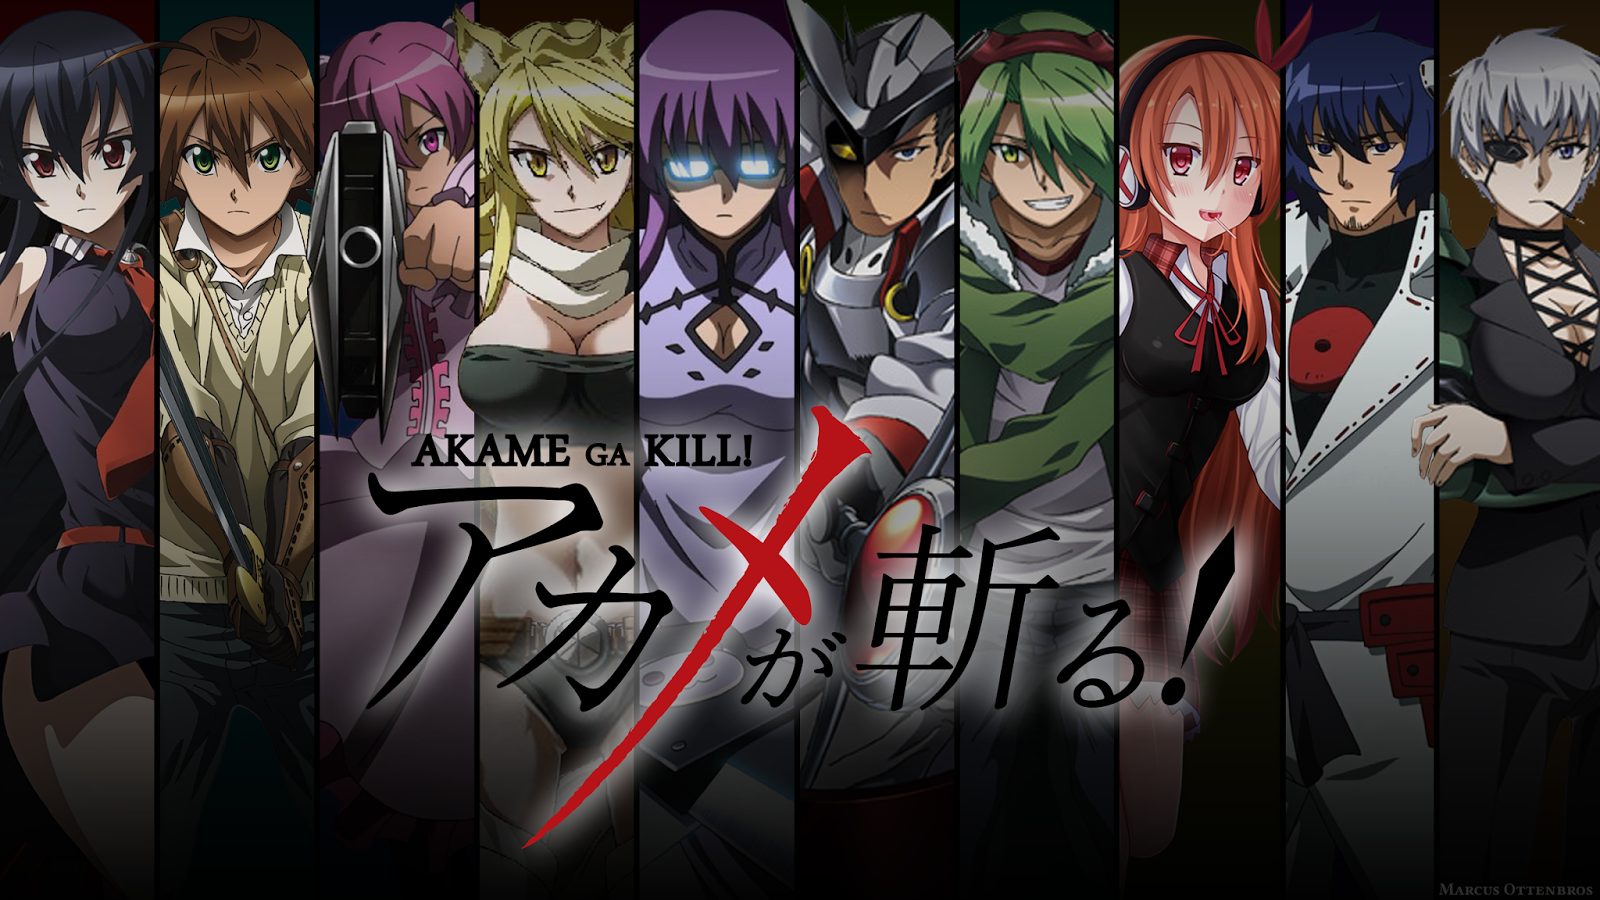 akame_ga_kill__by_marcus_sen-d8a239n.png